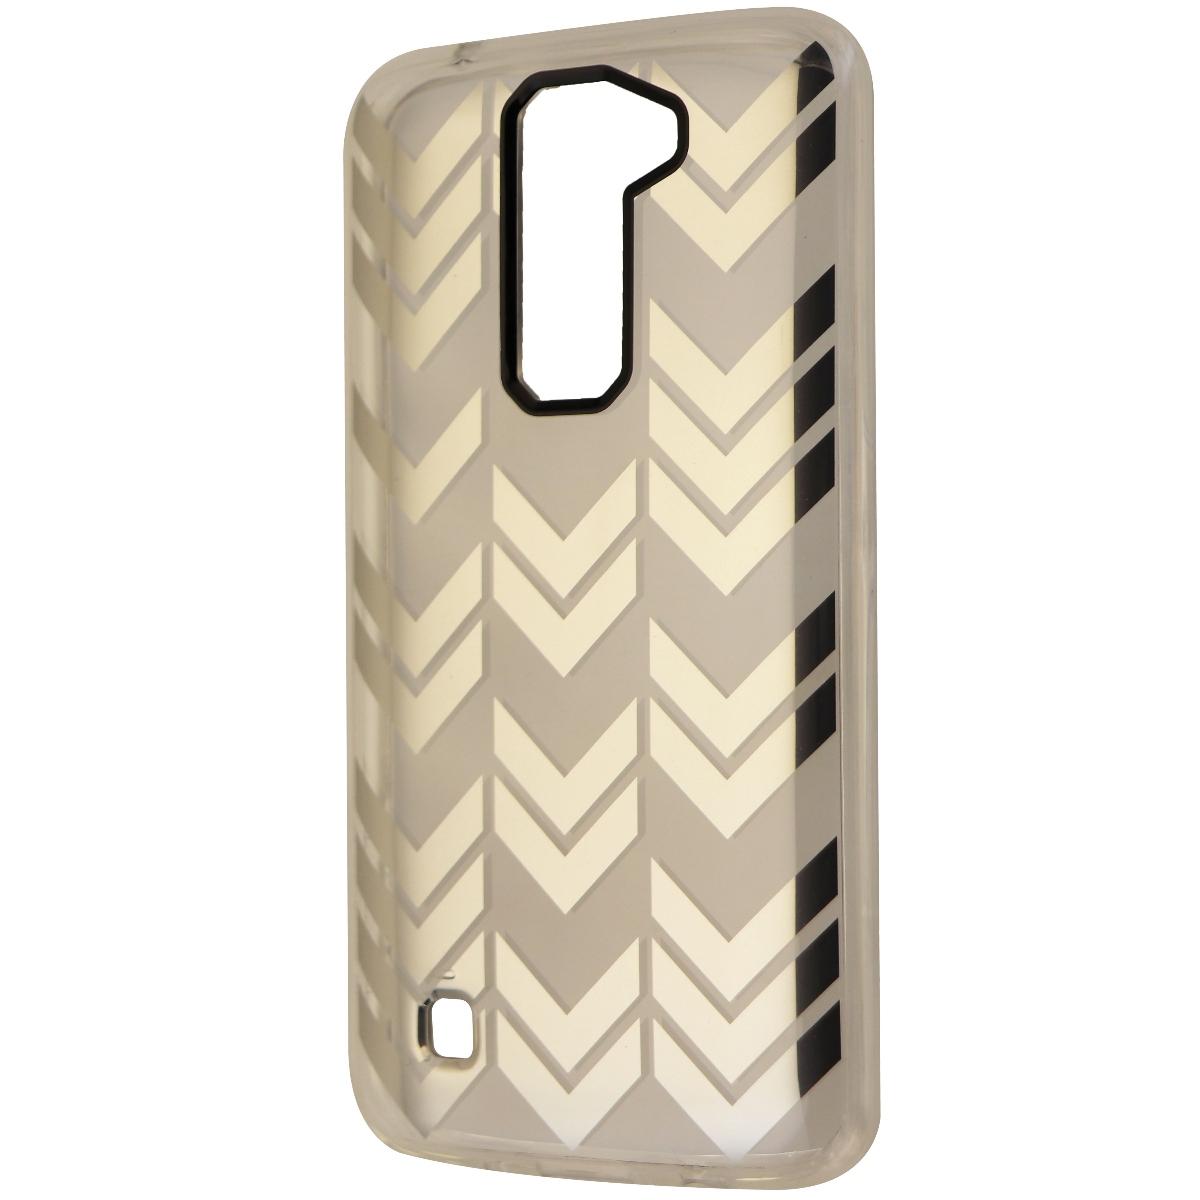 Incipio Design Series Hybrid Hard Case Cover for LG K7 - Clear/Silver Arrows